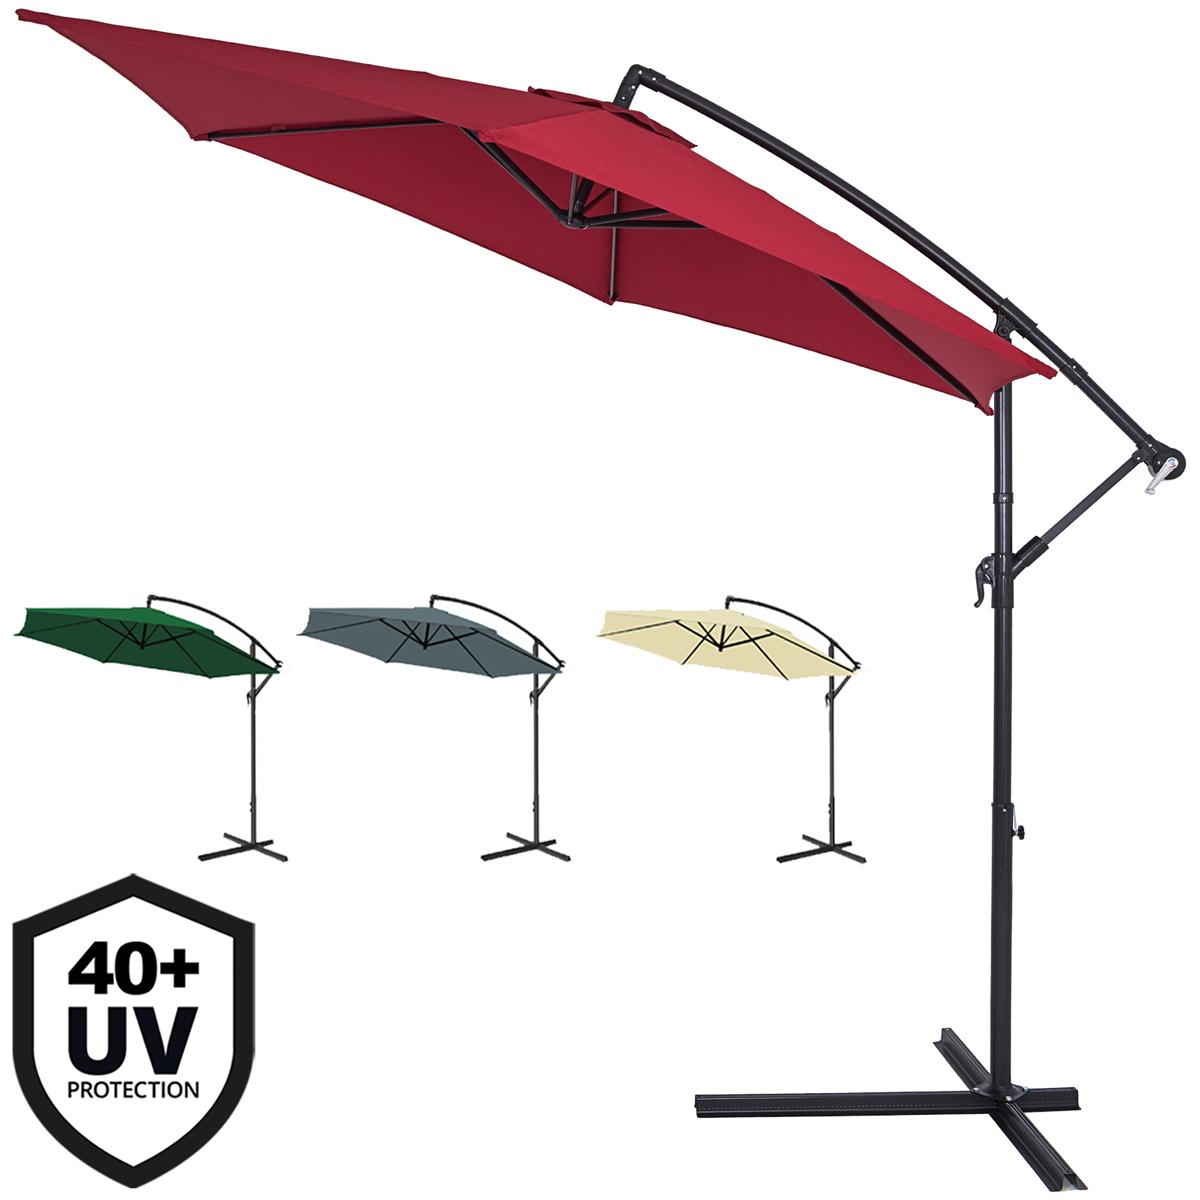 alu sonnenschirm ampelschirm kurbel schirm garten 300cm farbwahl uv schutz 40 ebay. Black Bedroom Furniture Sets. Home Design Ideas